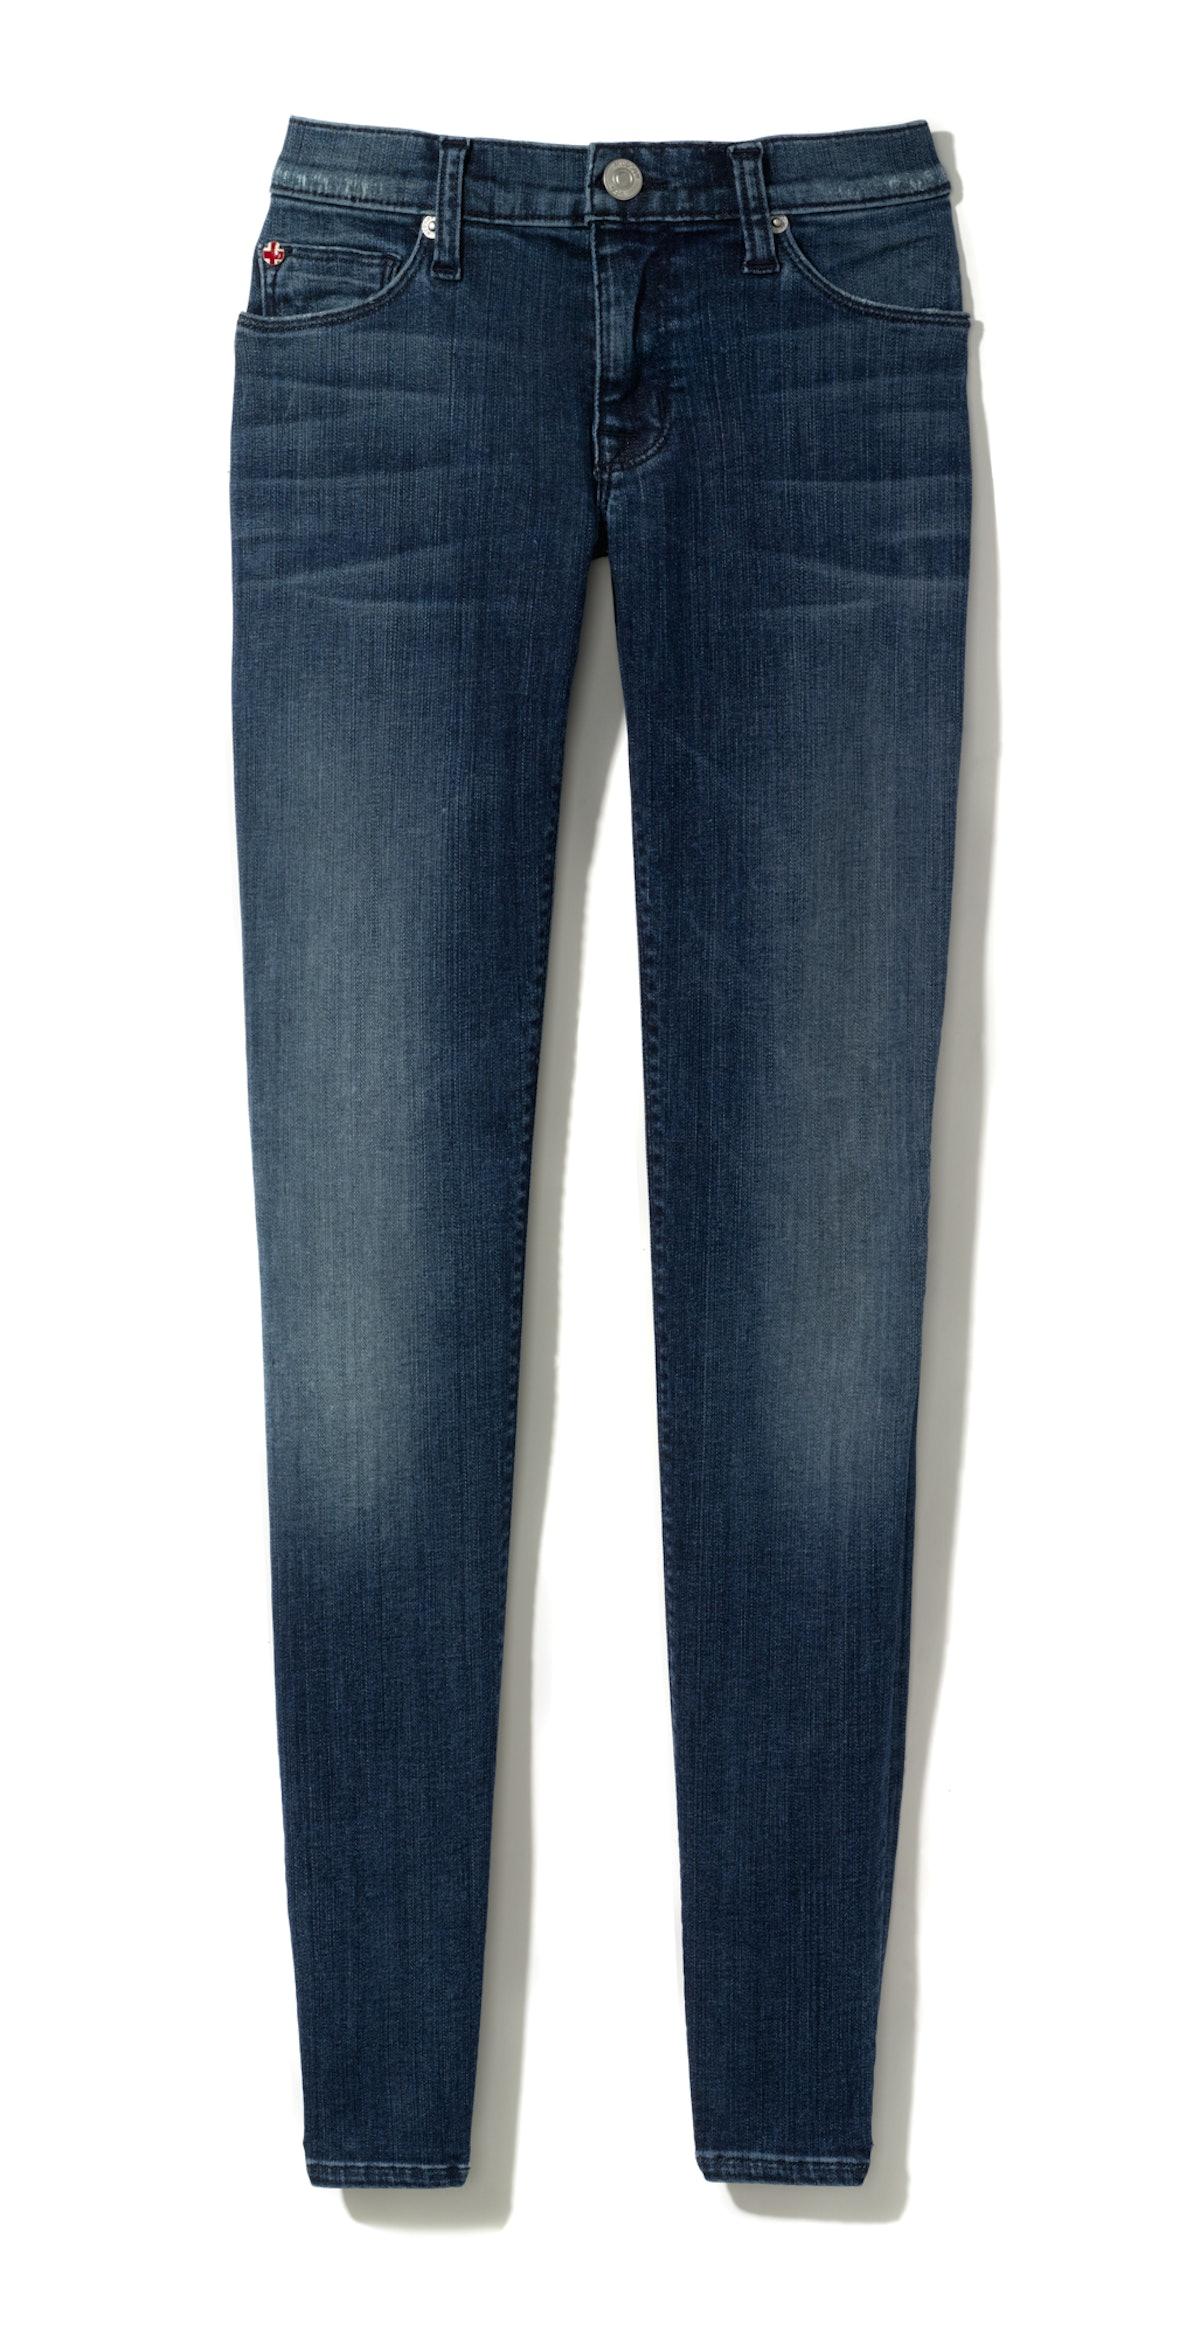 Hudson Jeans jeans, $189, hudsonjeans.com.